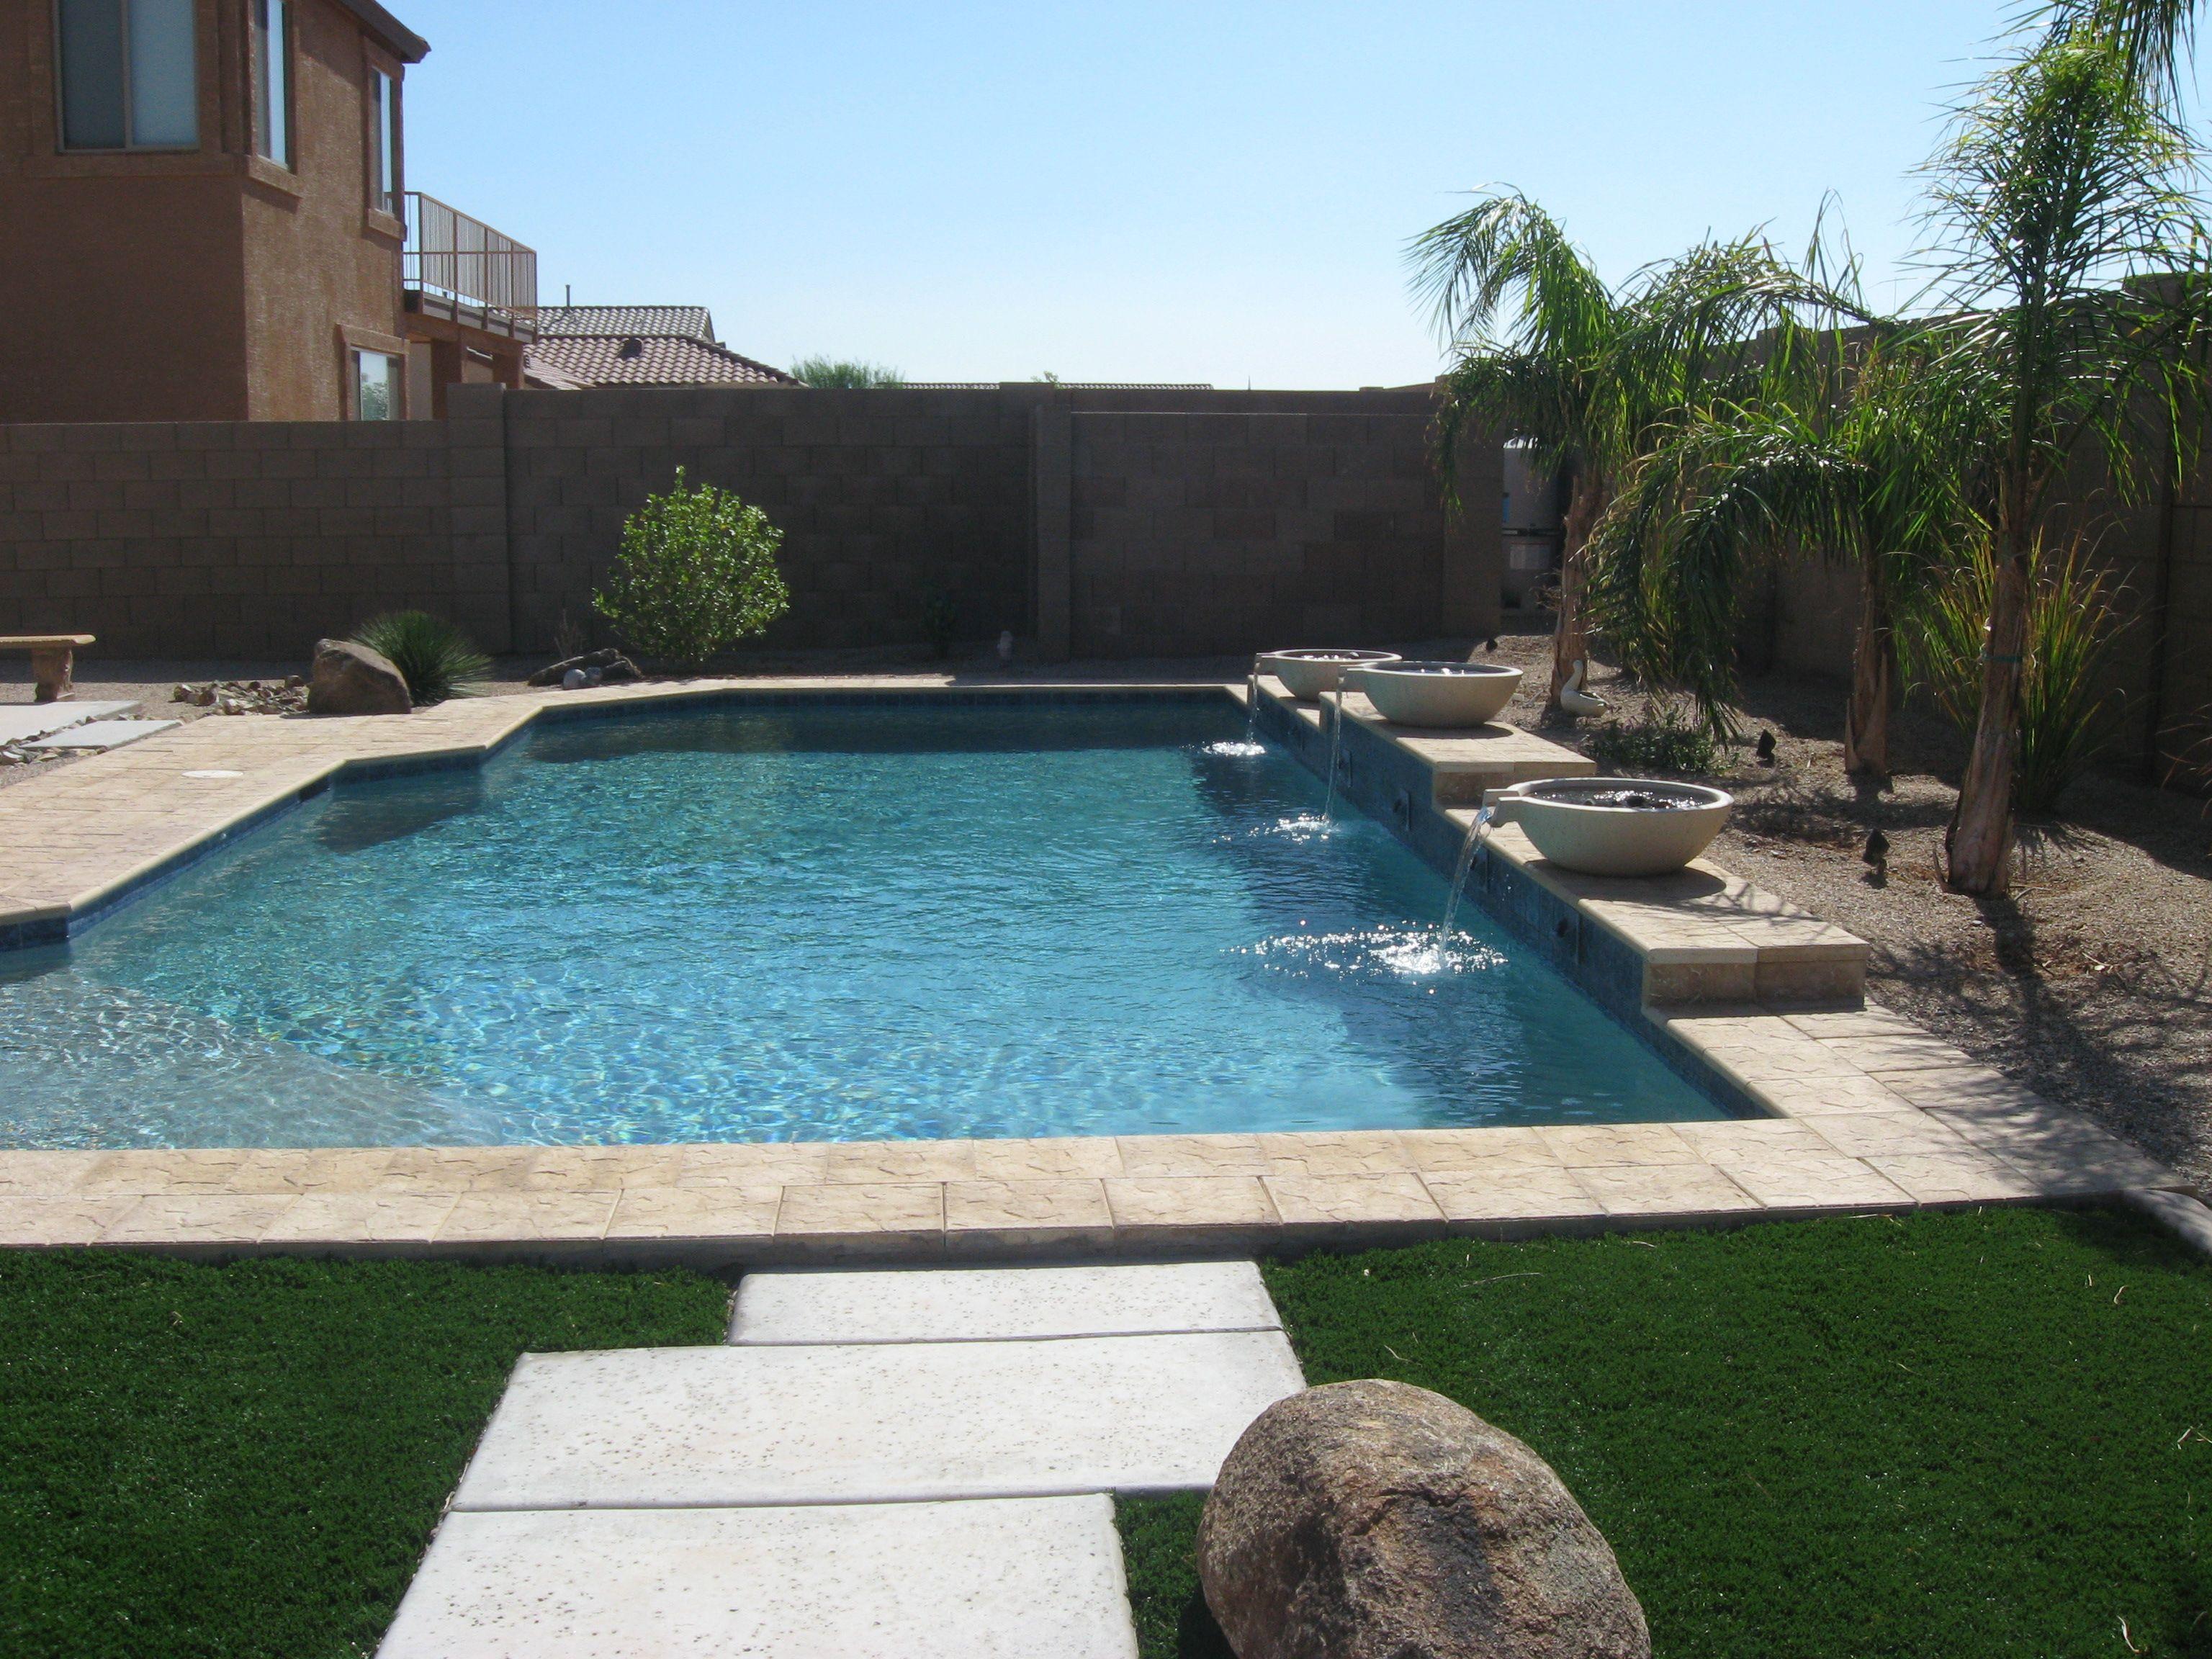 Typical Pool In Phx Az Pool Houses Backyard Pool Pool Patio